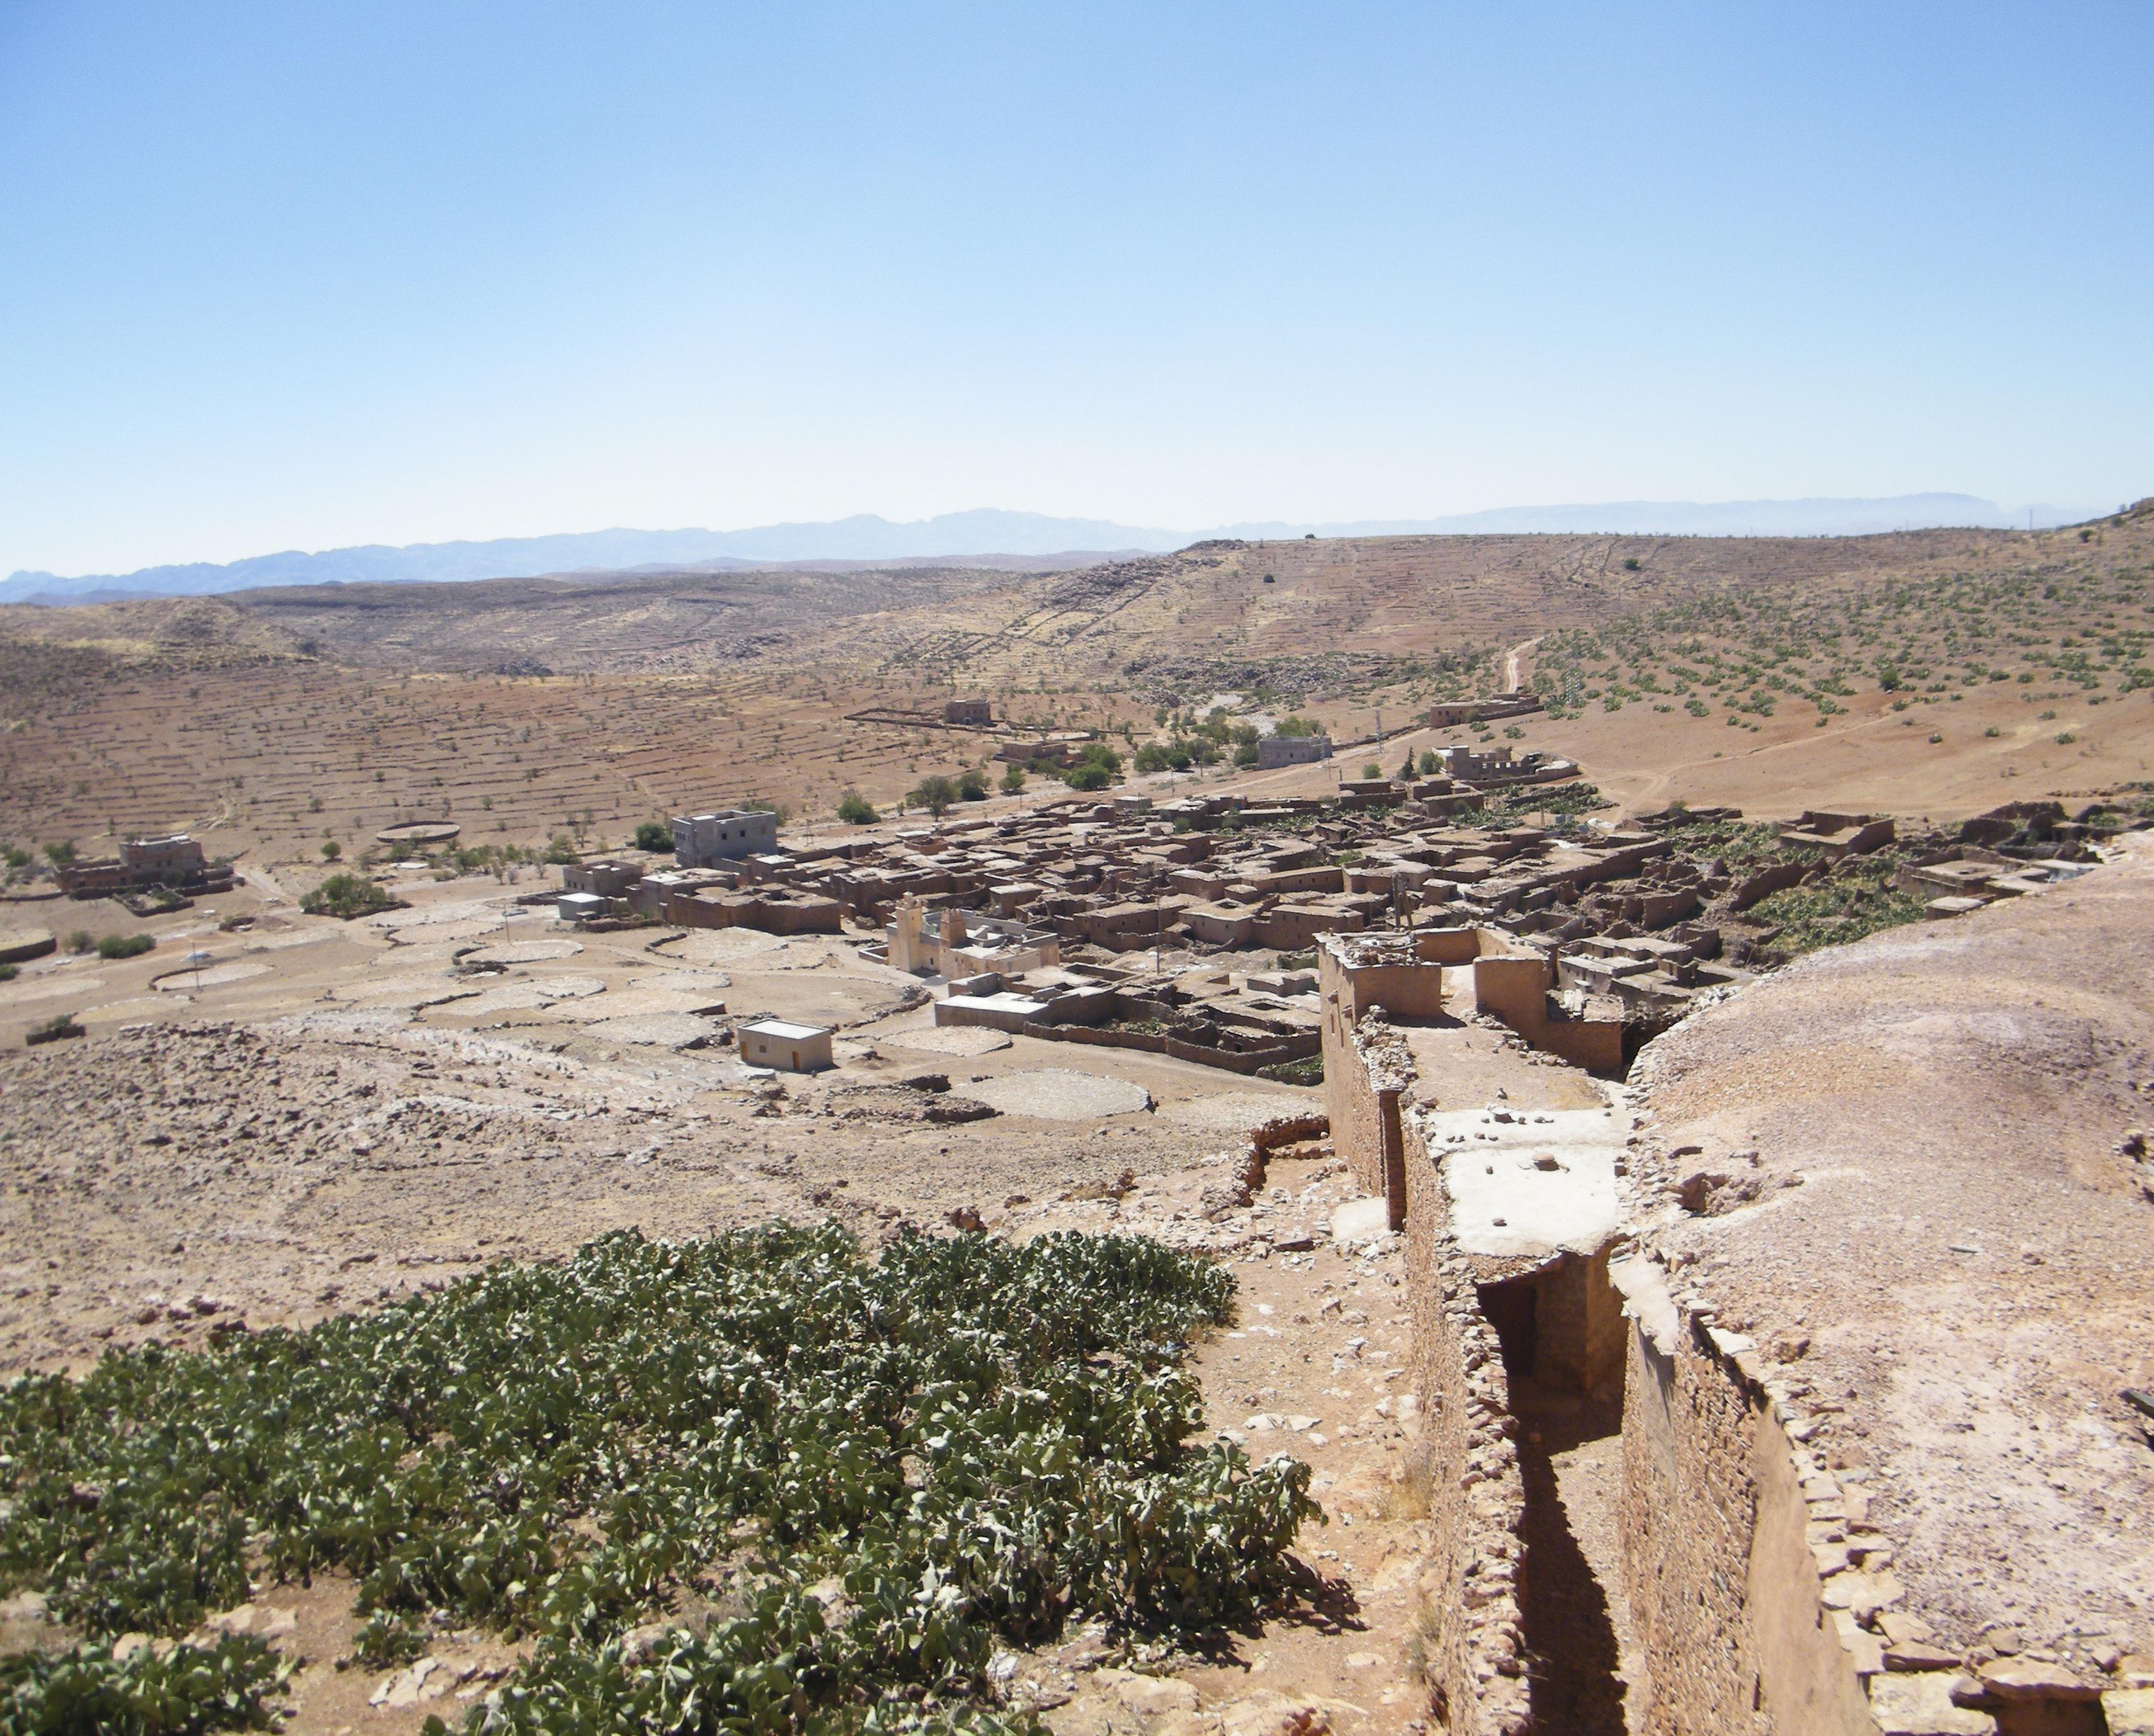 greniers berberes dans le souss marocain